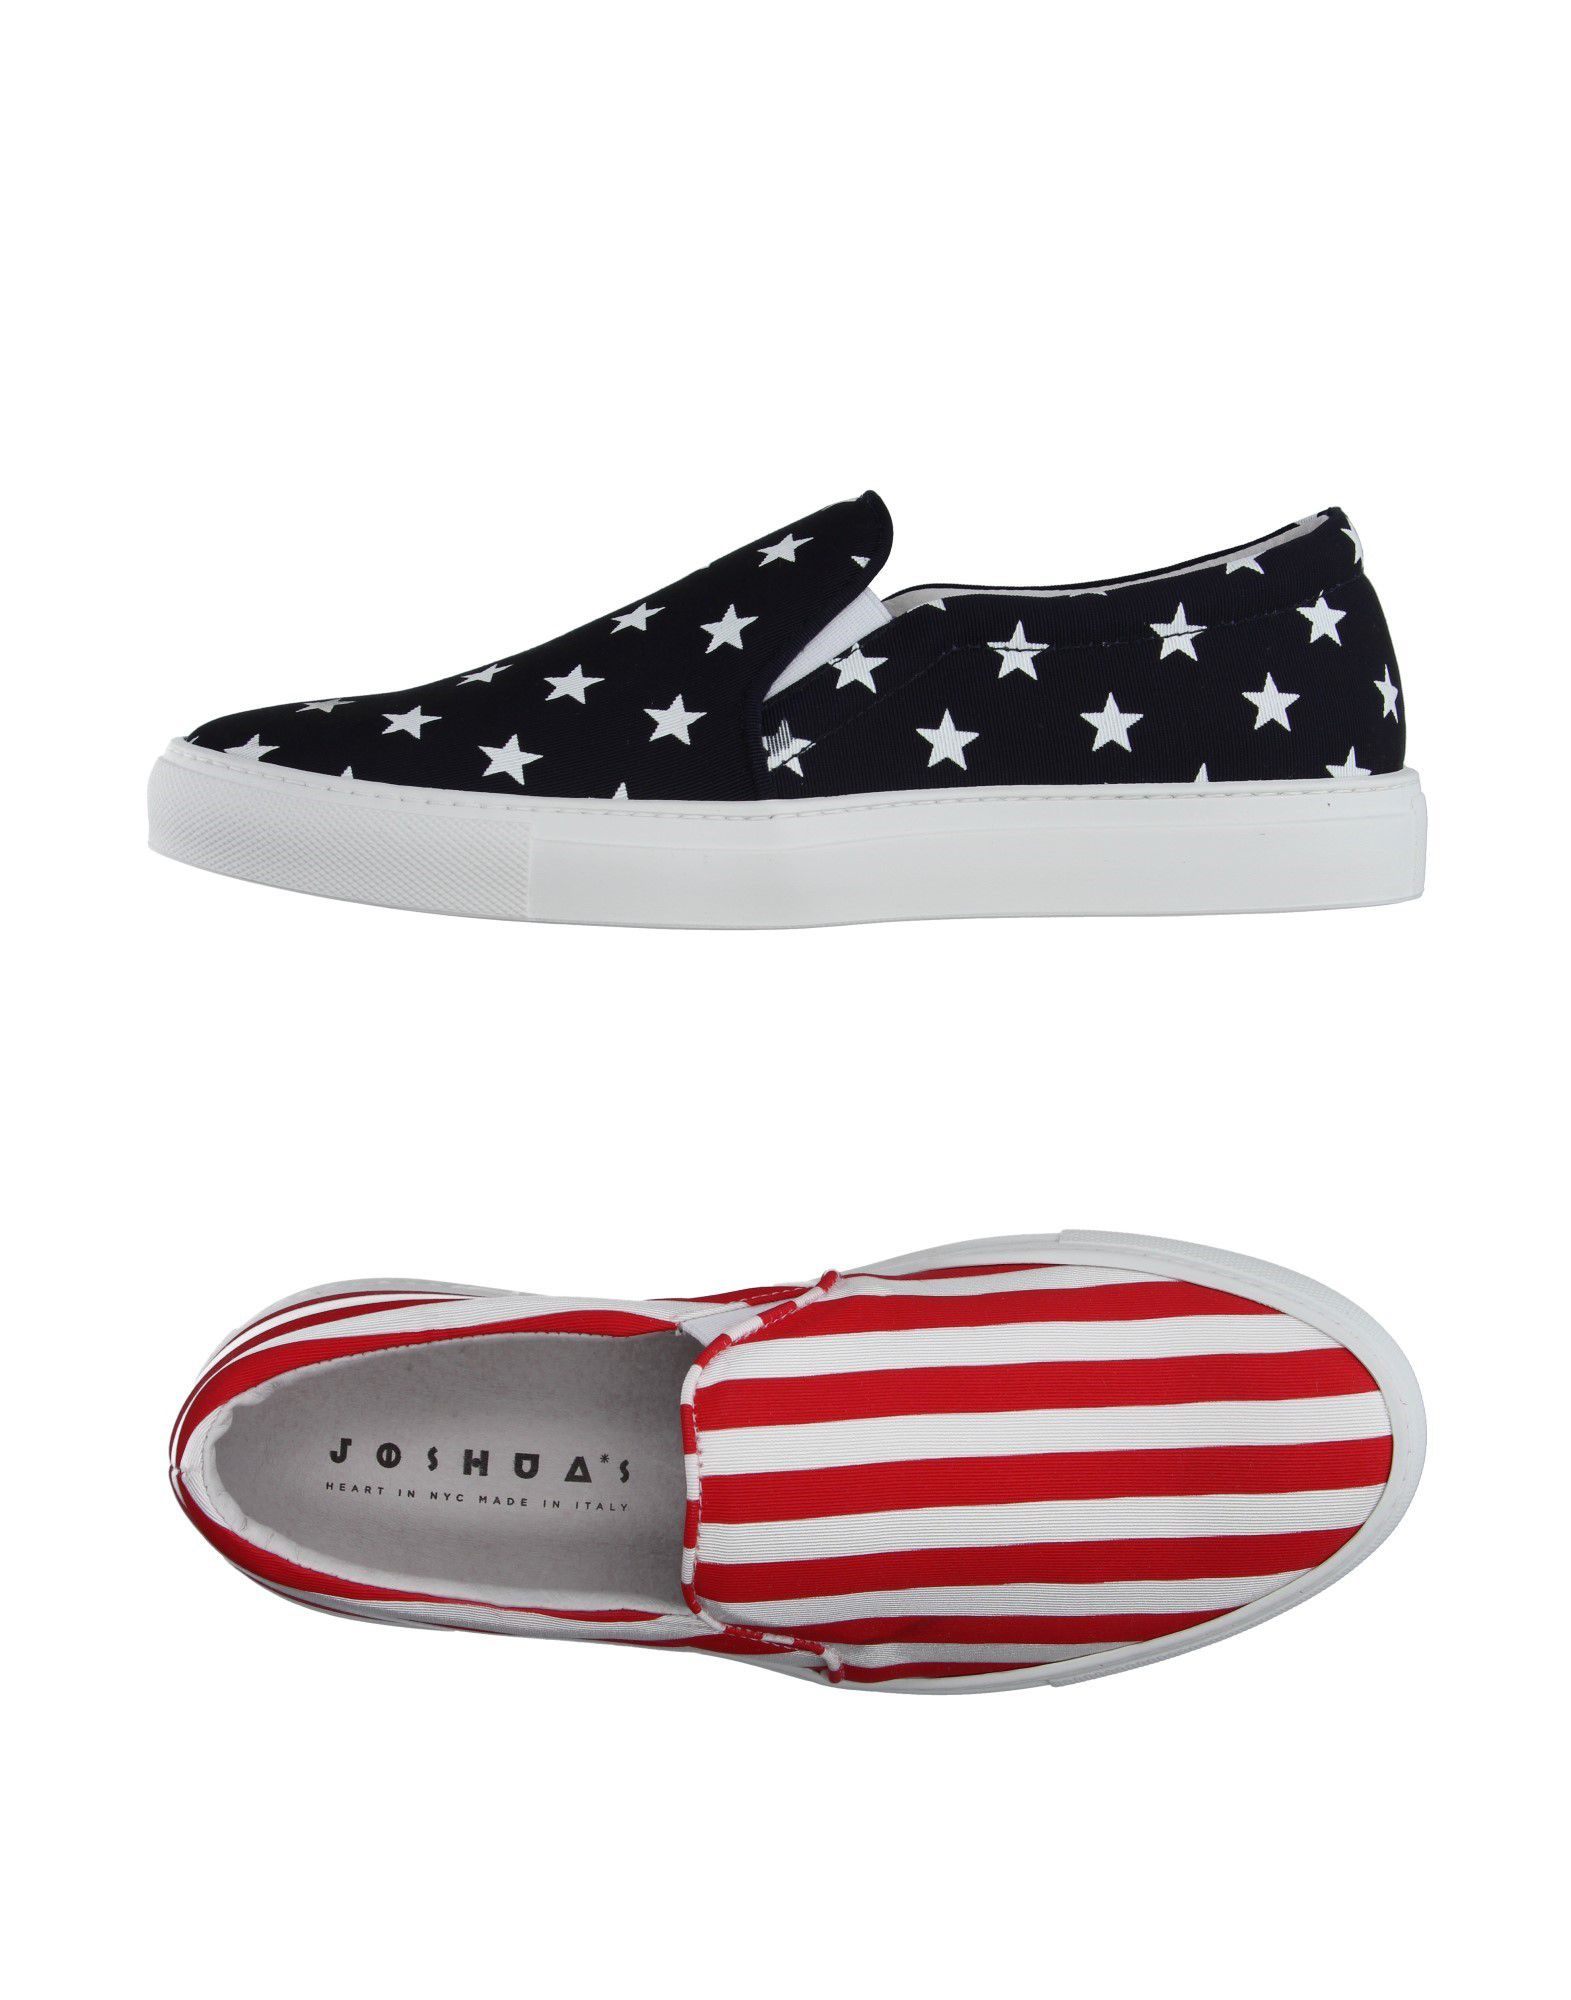 Joshua*S Sneakers Herren Heiße  11104940CC Heiße Herren Schuhe 32e4d9